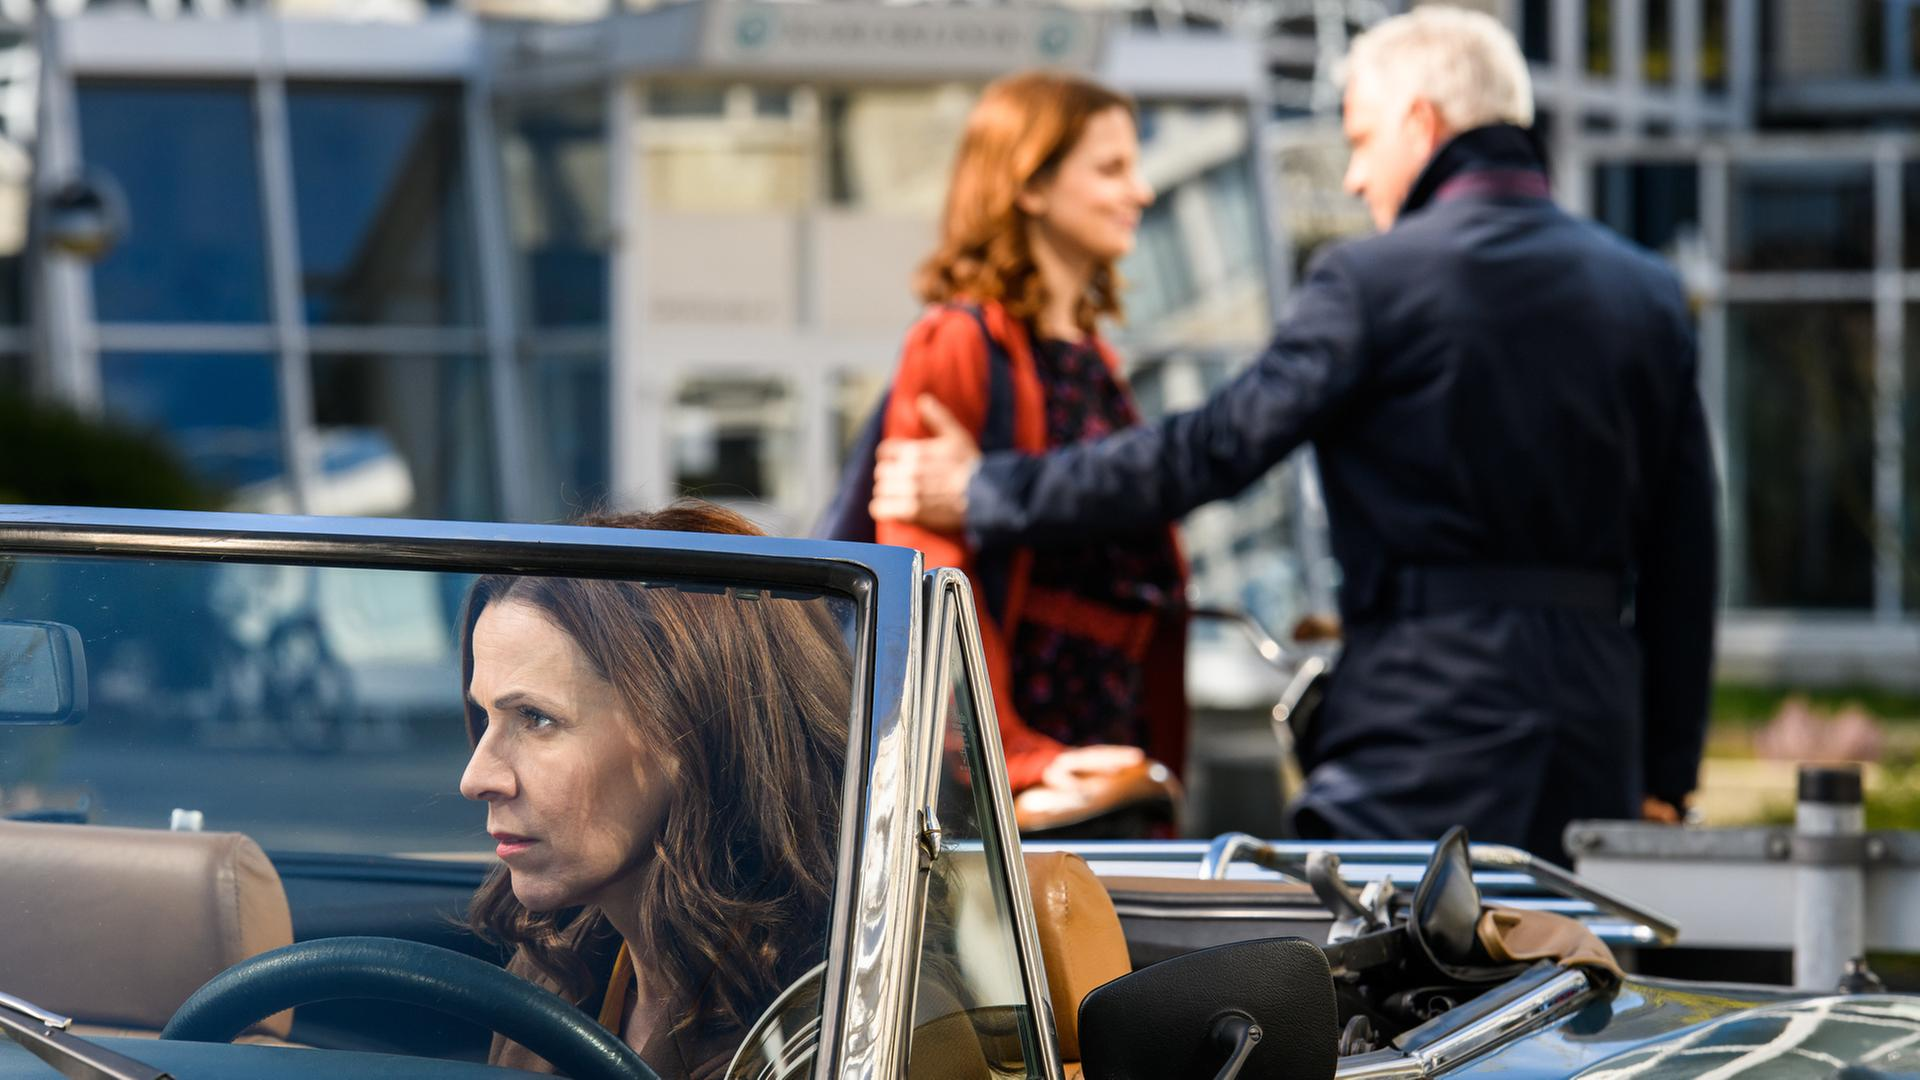 Koln Neue Staffel Der Tv Serie Bettys Diagnose Wird In Longerich Gedreht Kolner Stadt Anzeiger